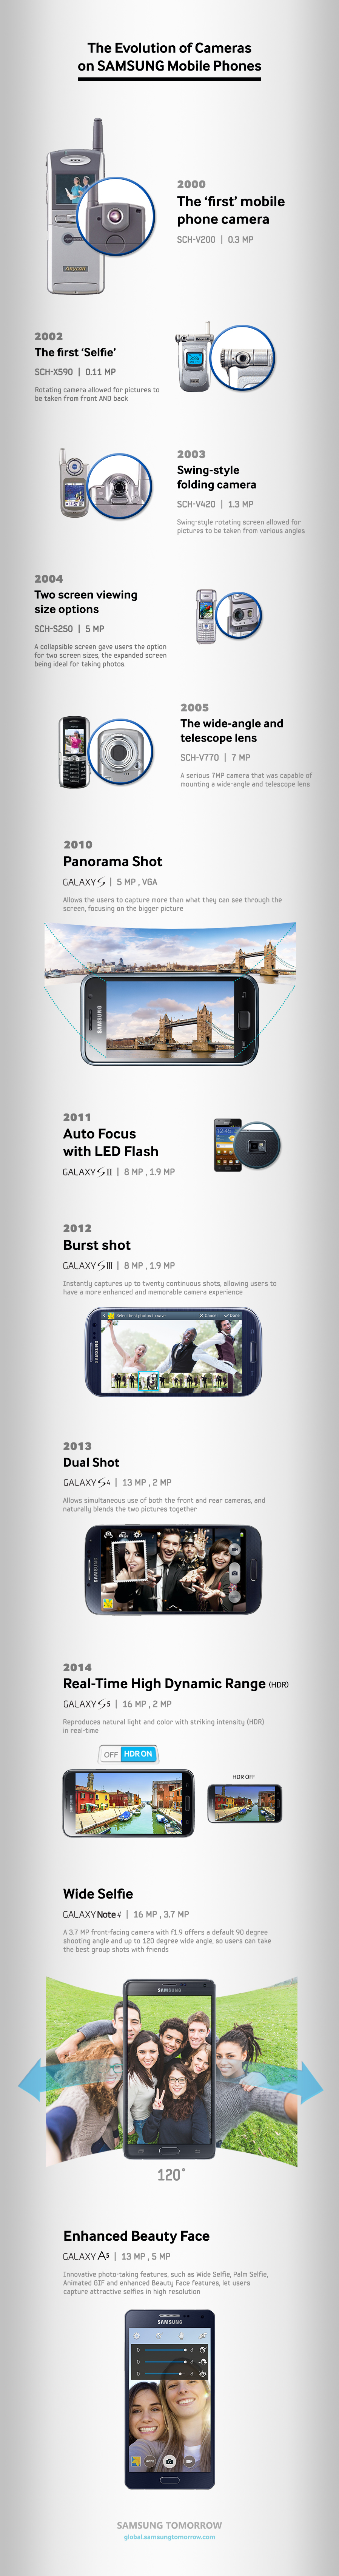 Smart Phone Camera History